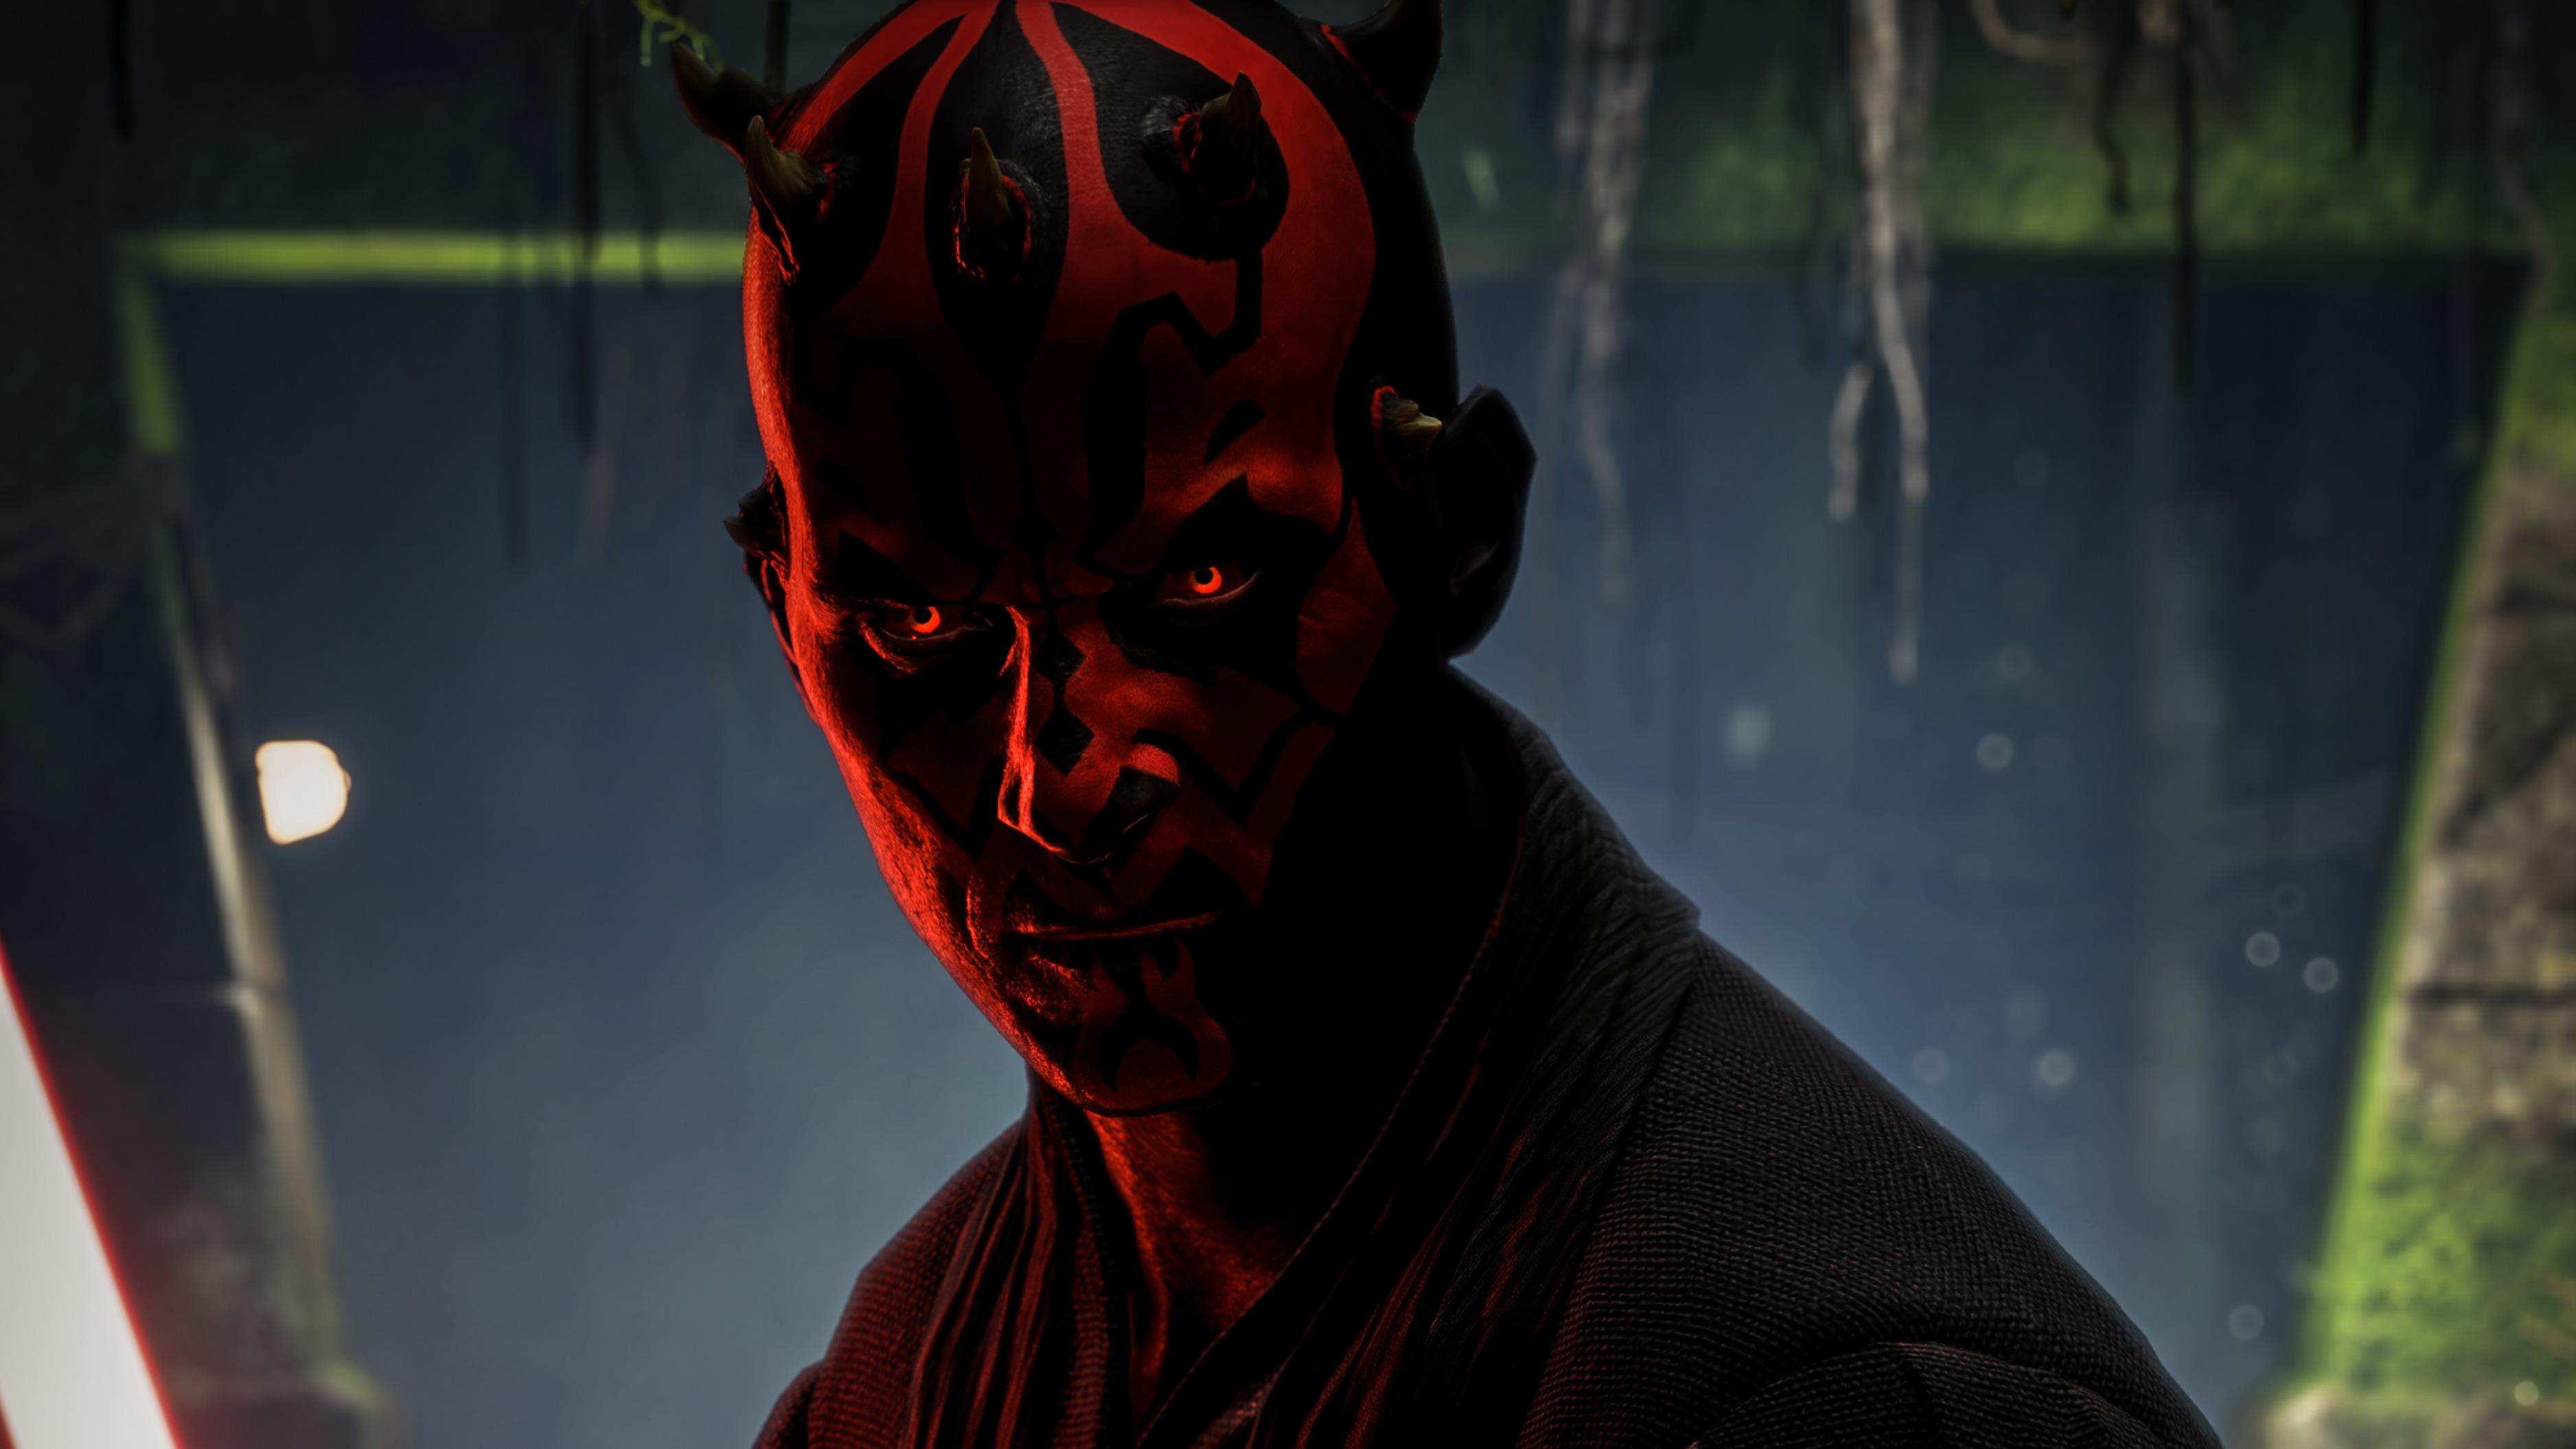 Darth Maul Star Wars Battlefront 2 4k Hd Games 4k